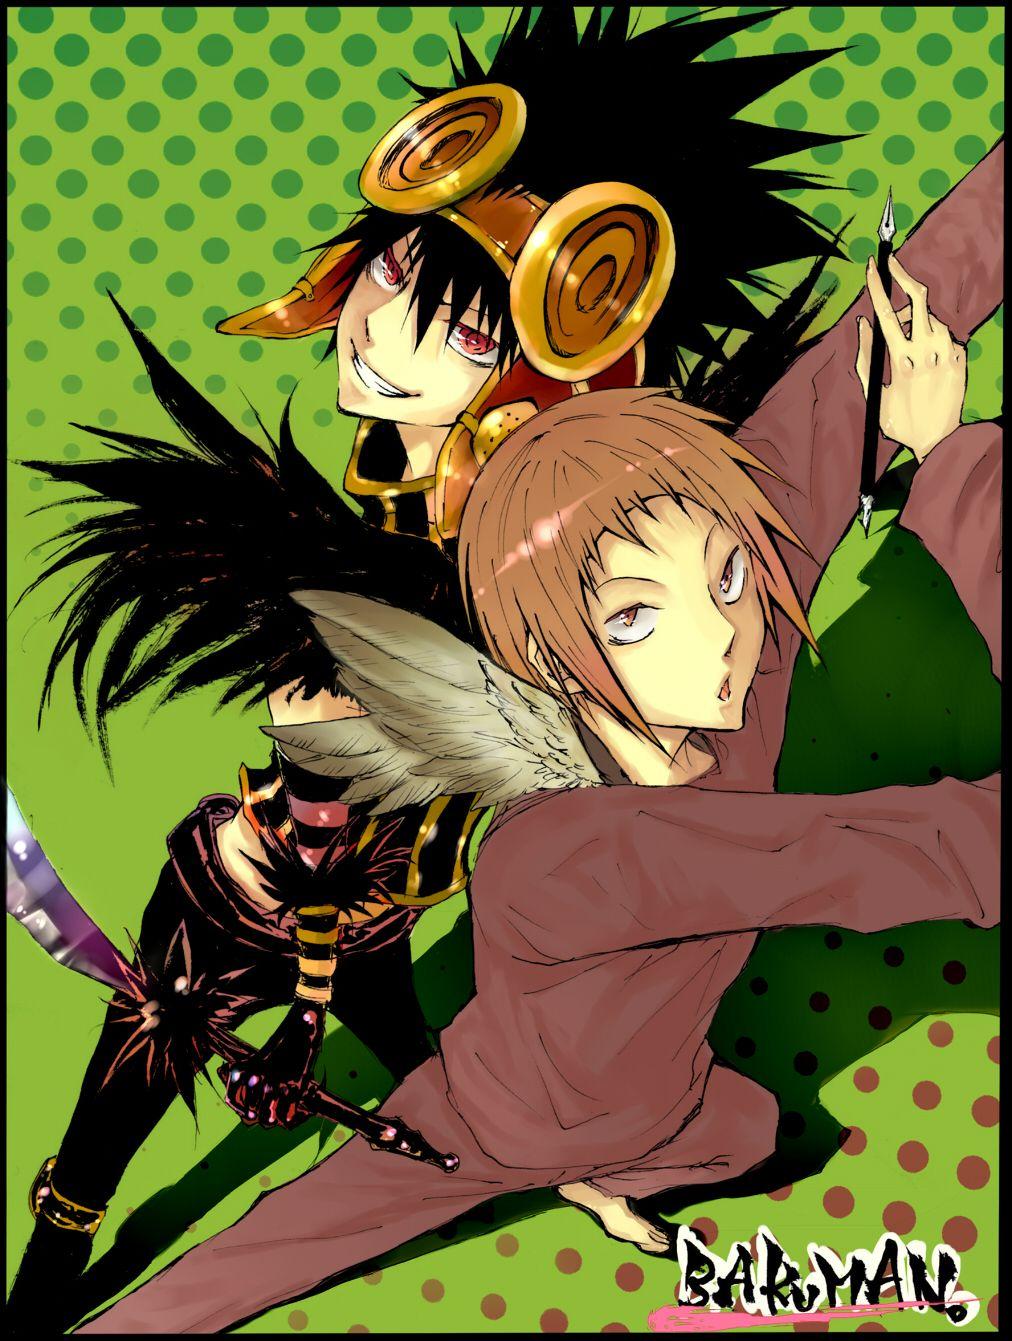 Bakuman / Niizuma Eiji & Crow Anime, Manga, Desenho